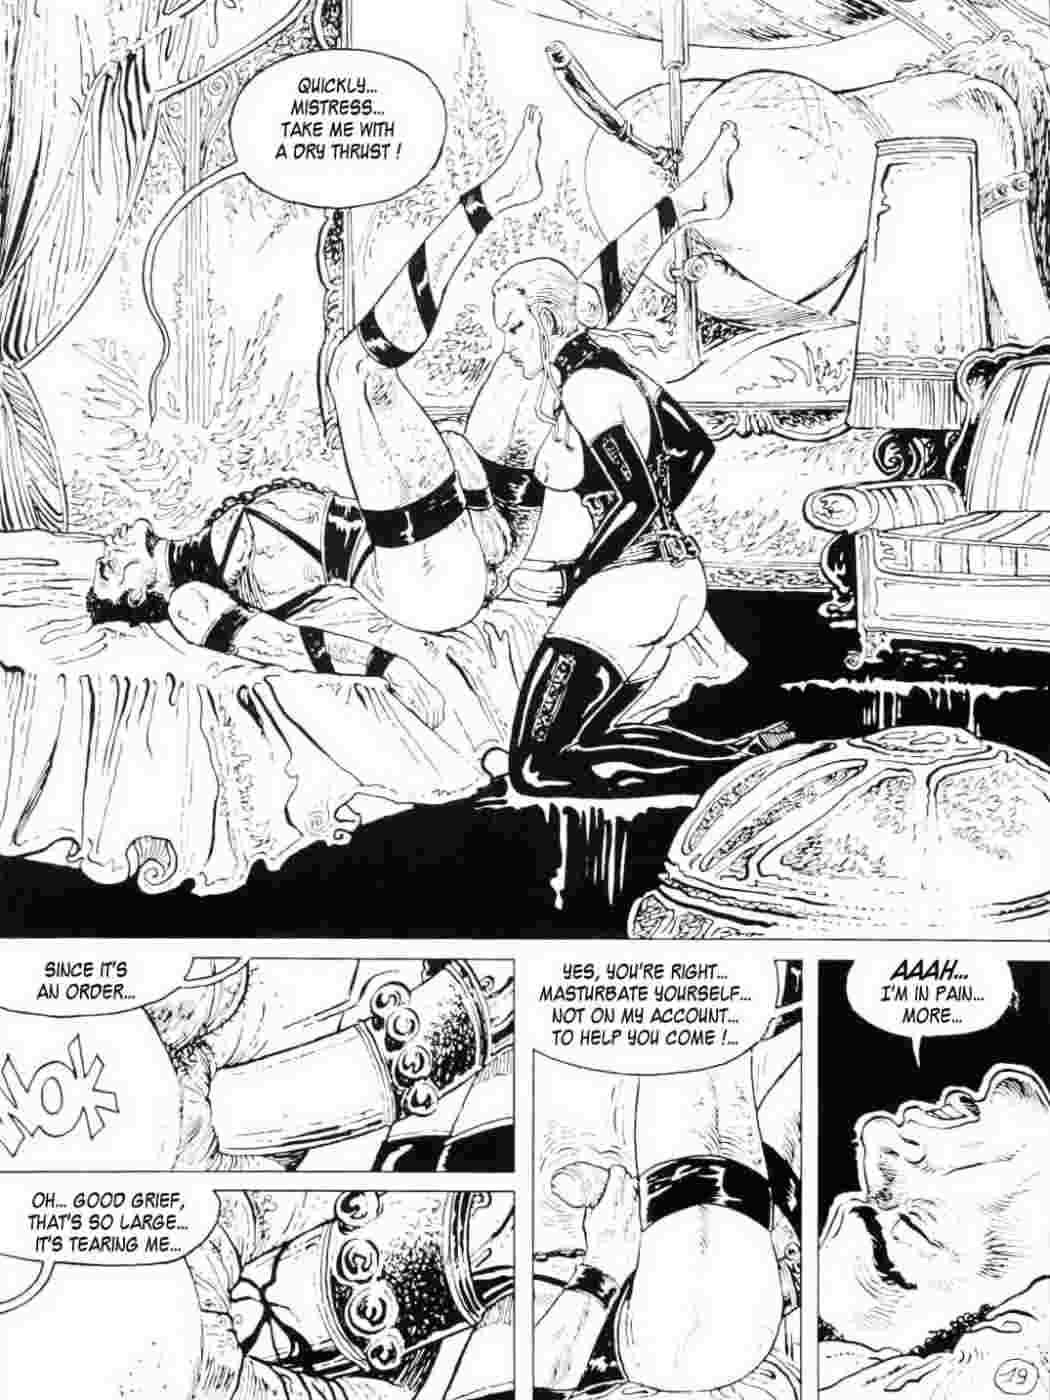 Comic strapon Strapon cartoon